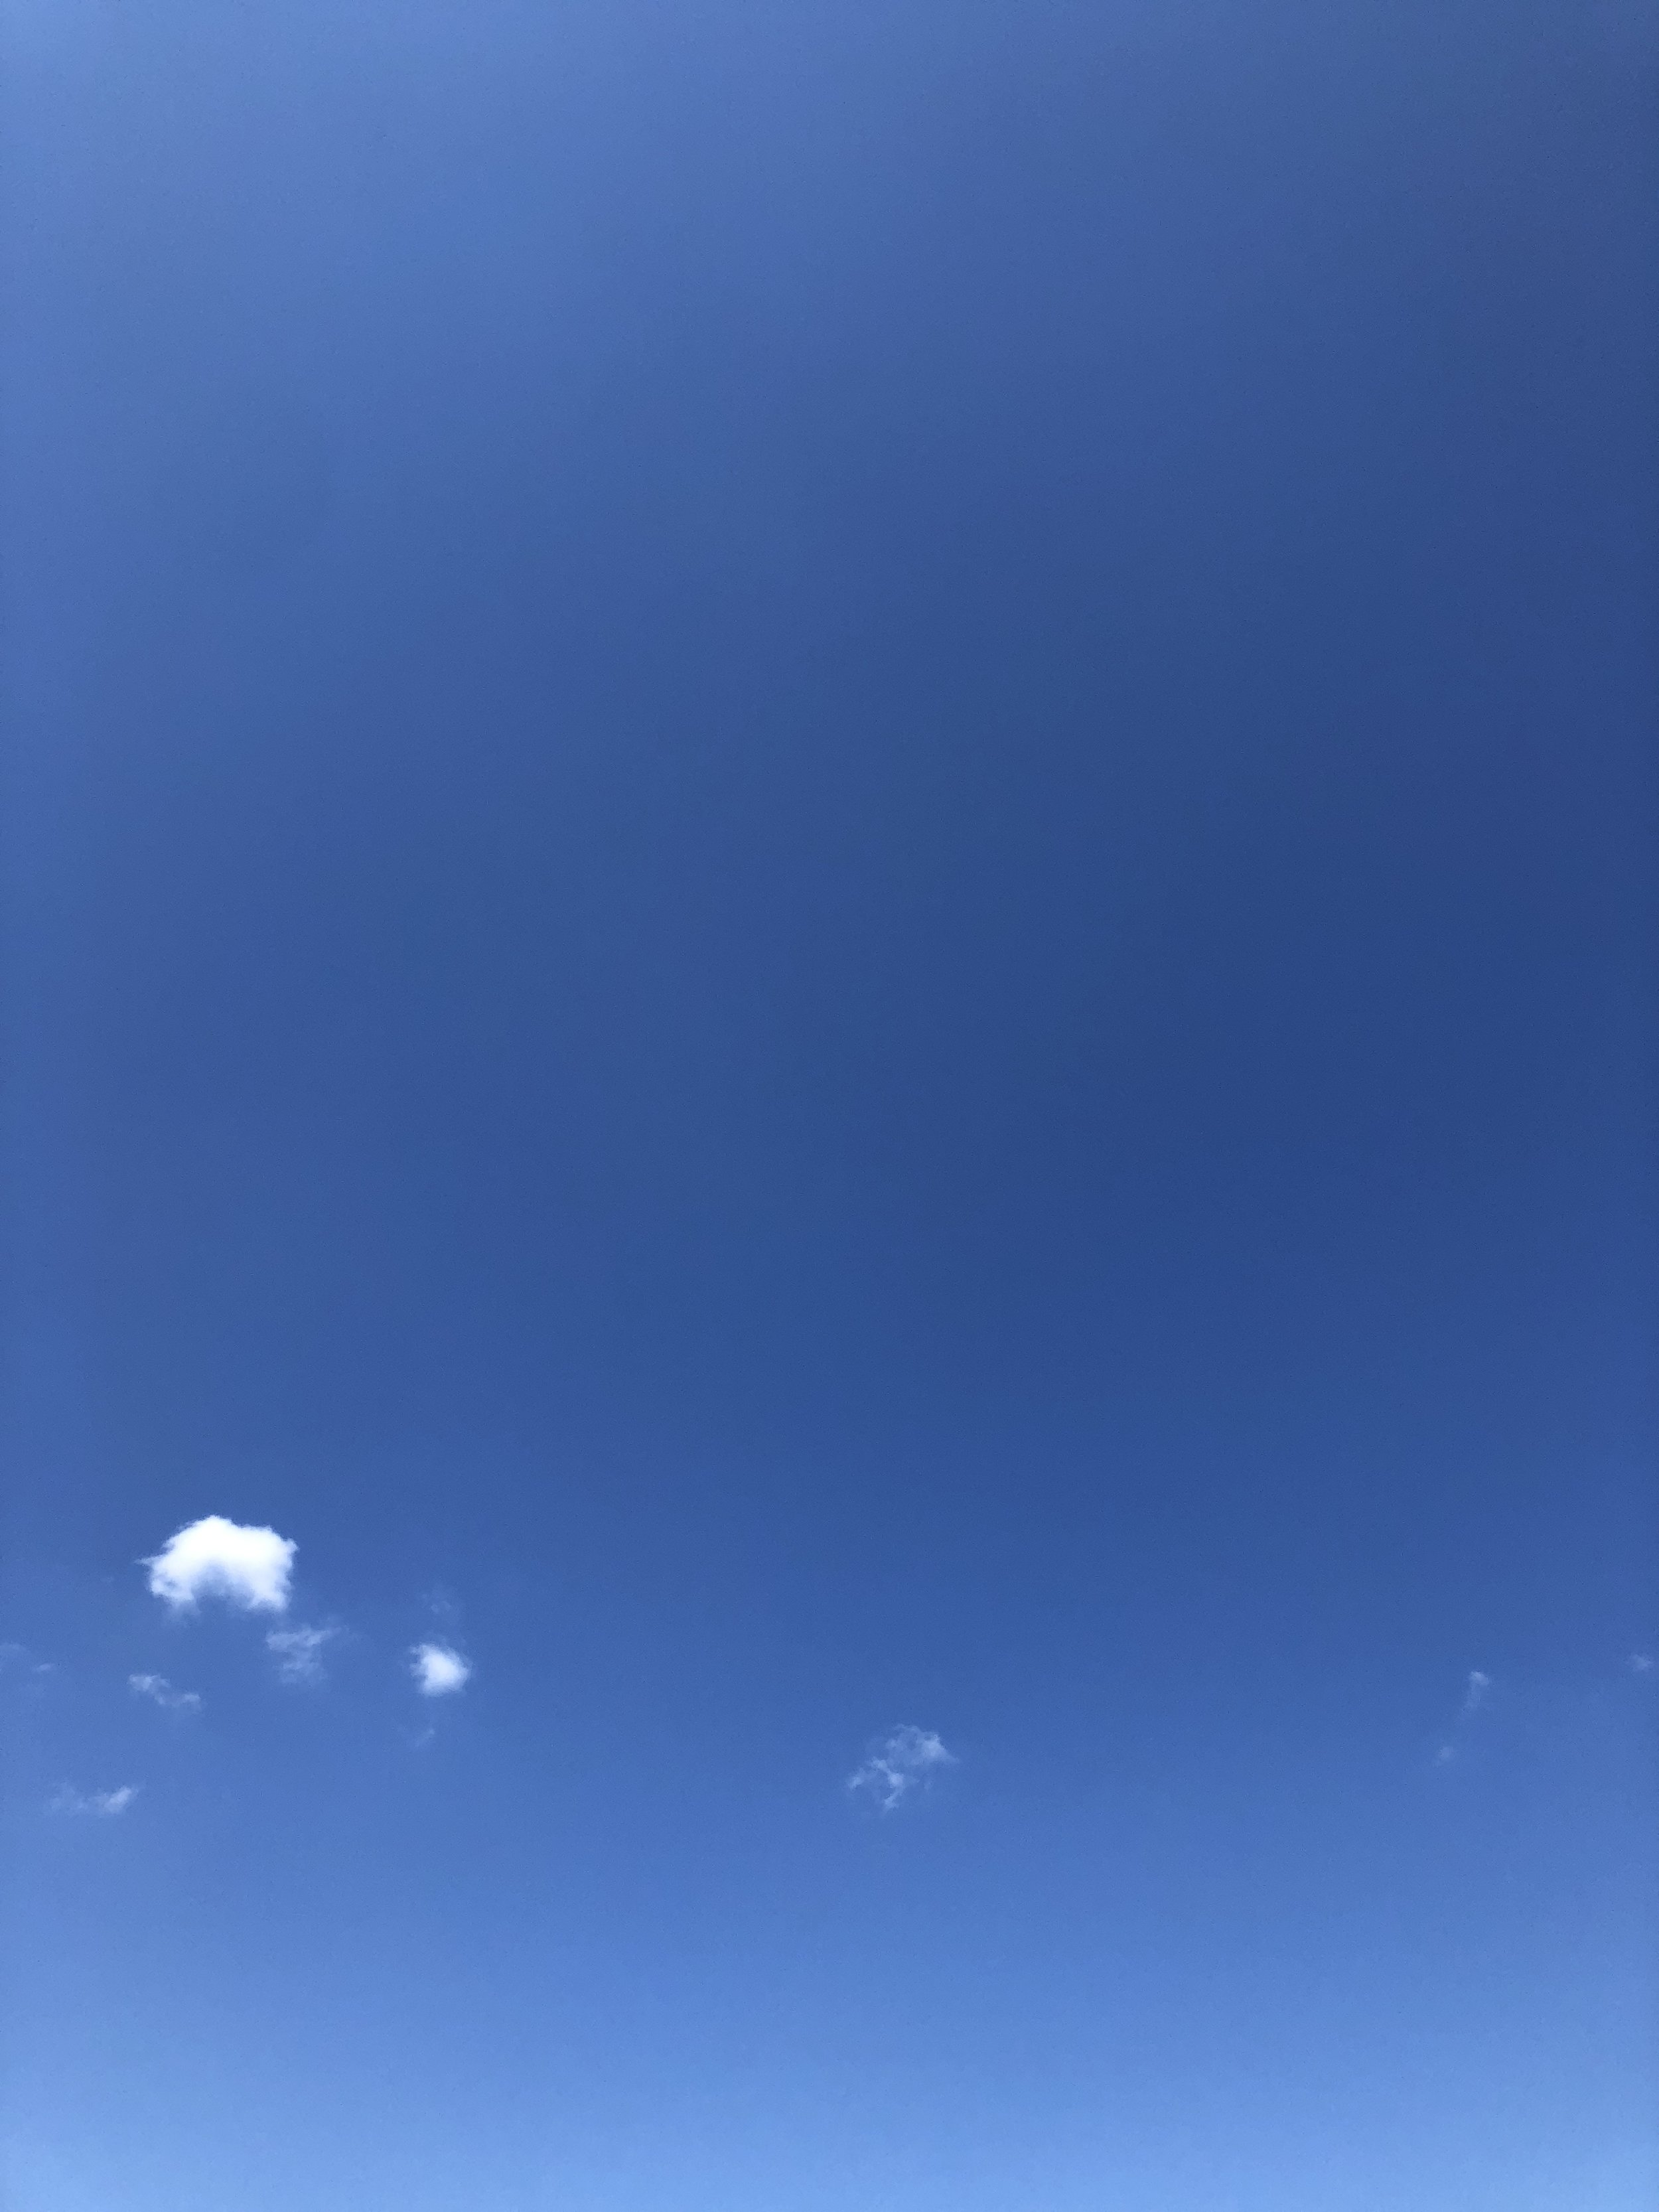 Glimsen-tiny-cloud.JPG